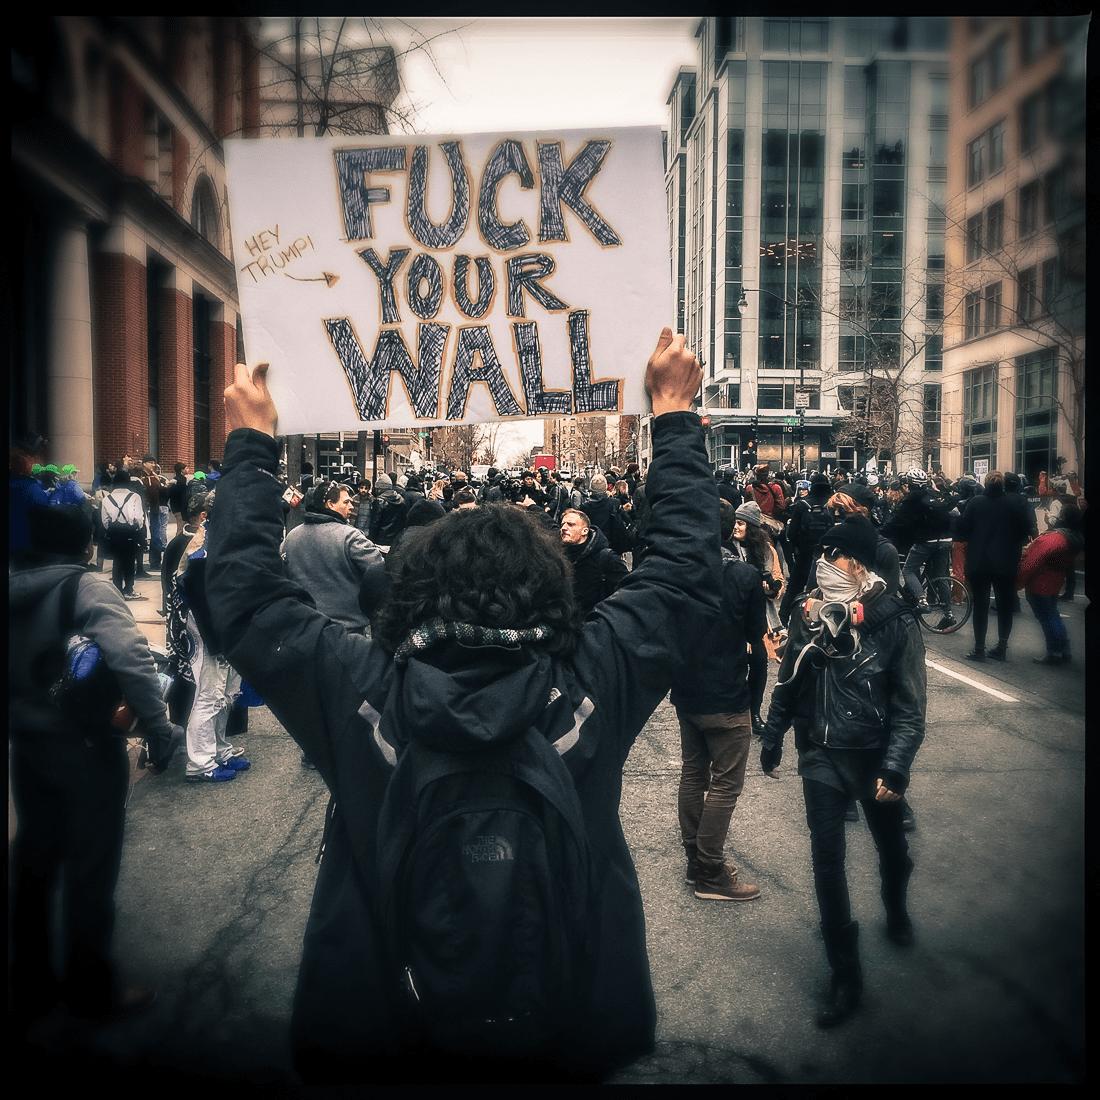 12th Street NW, January 20